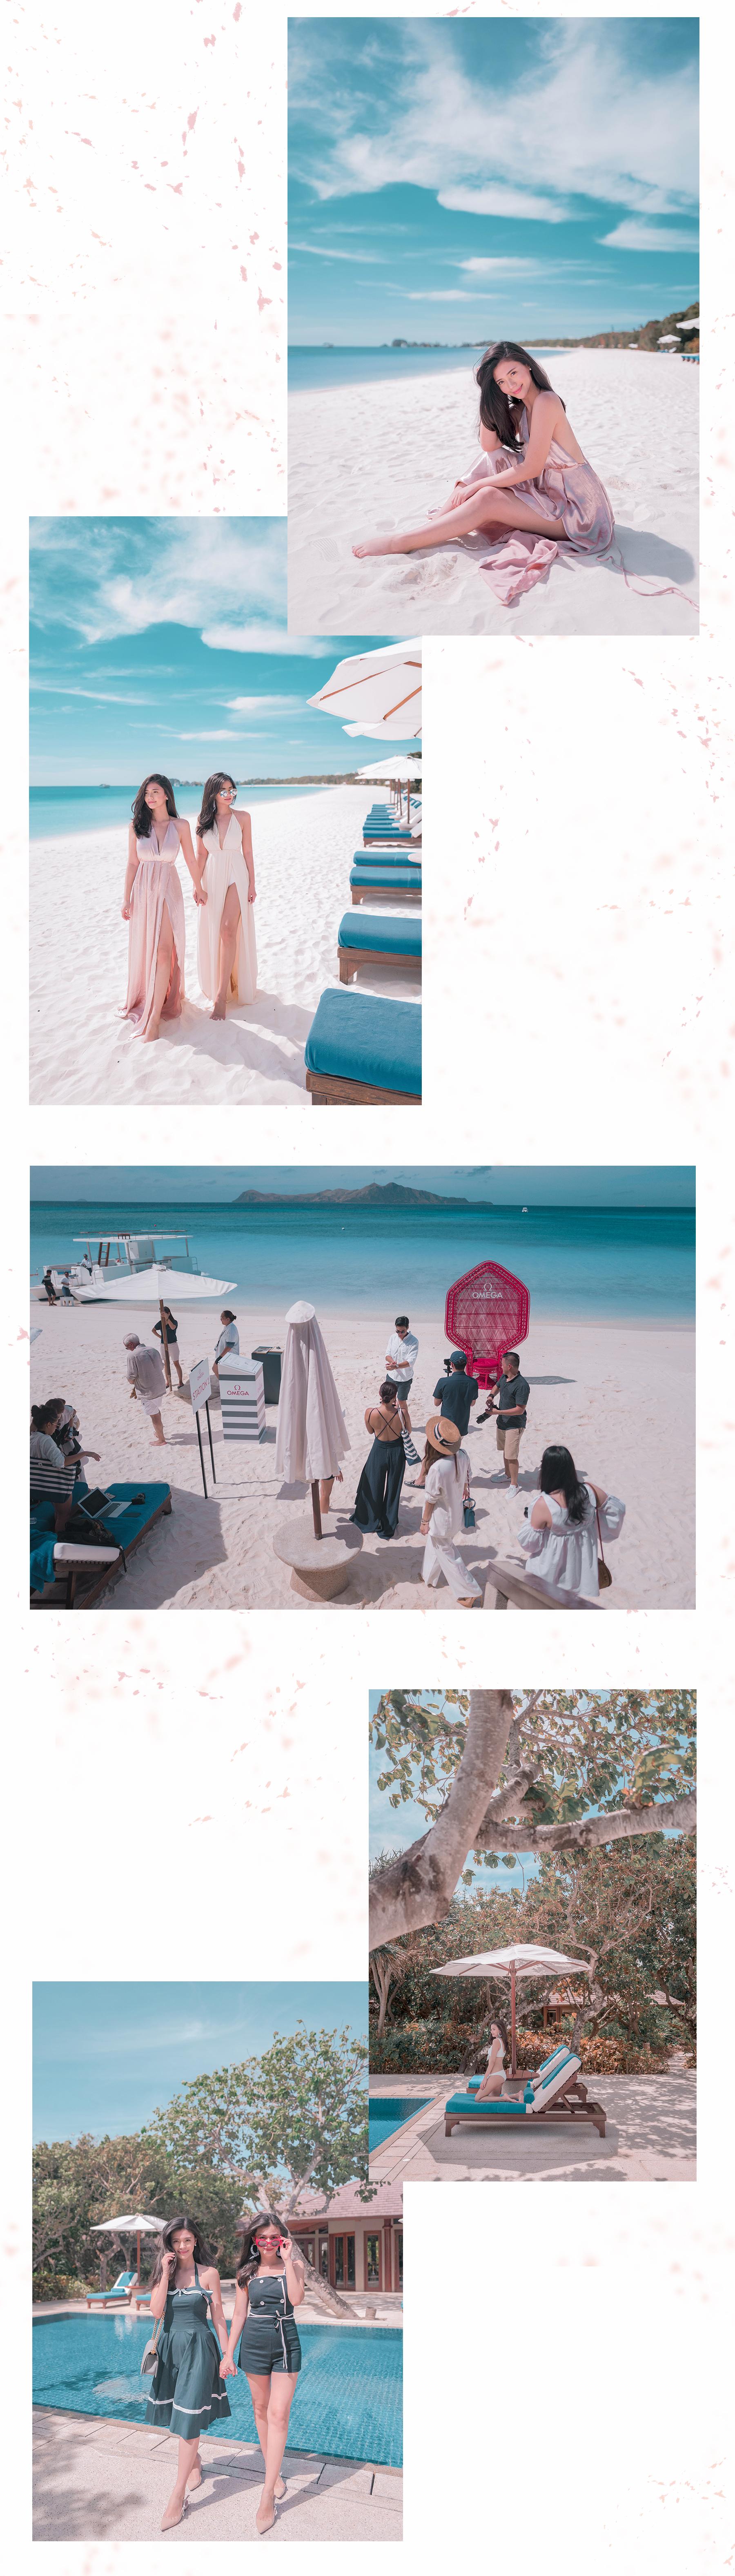 VV Amanpulo Beach 3